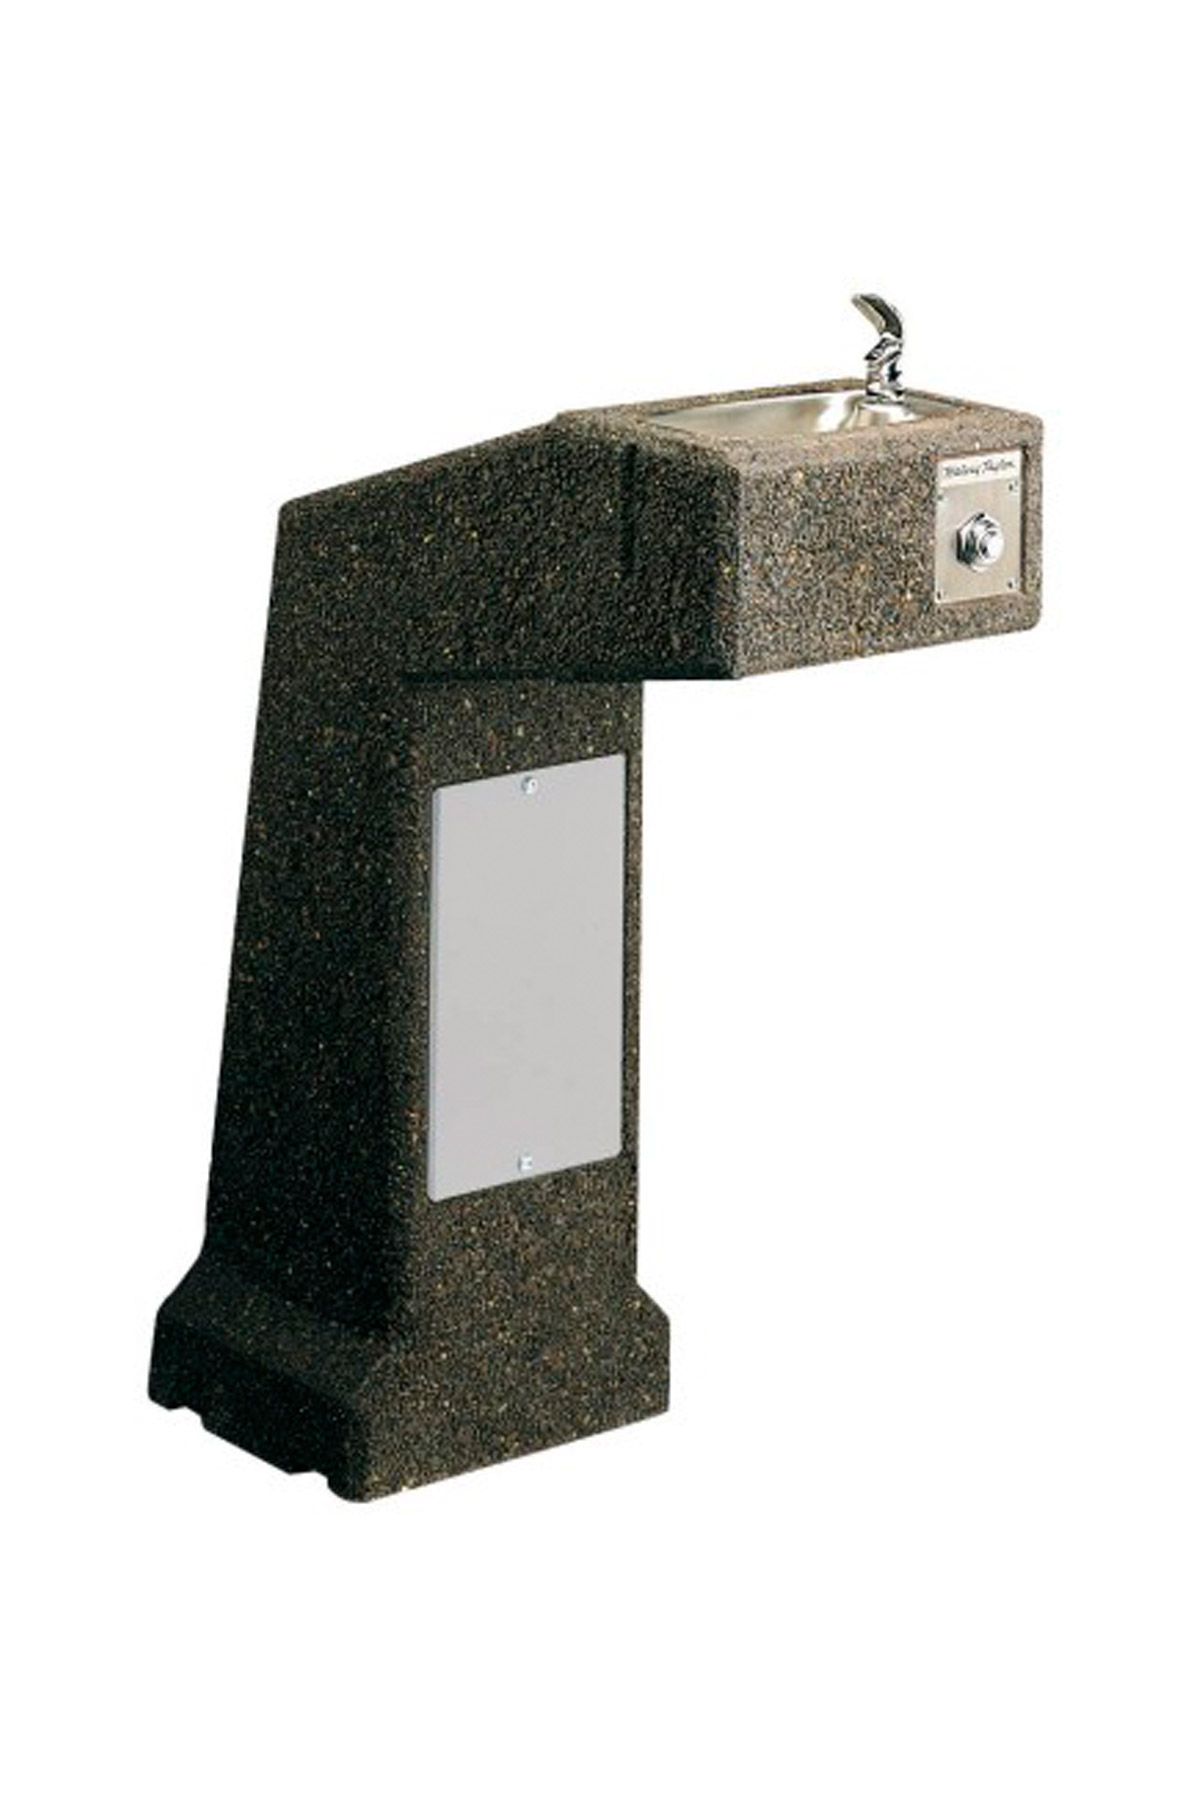 Pedestal De Piedra Texturizado 4590 Bebederos De Agua